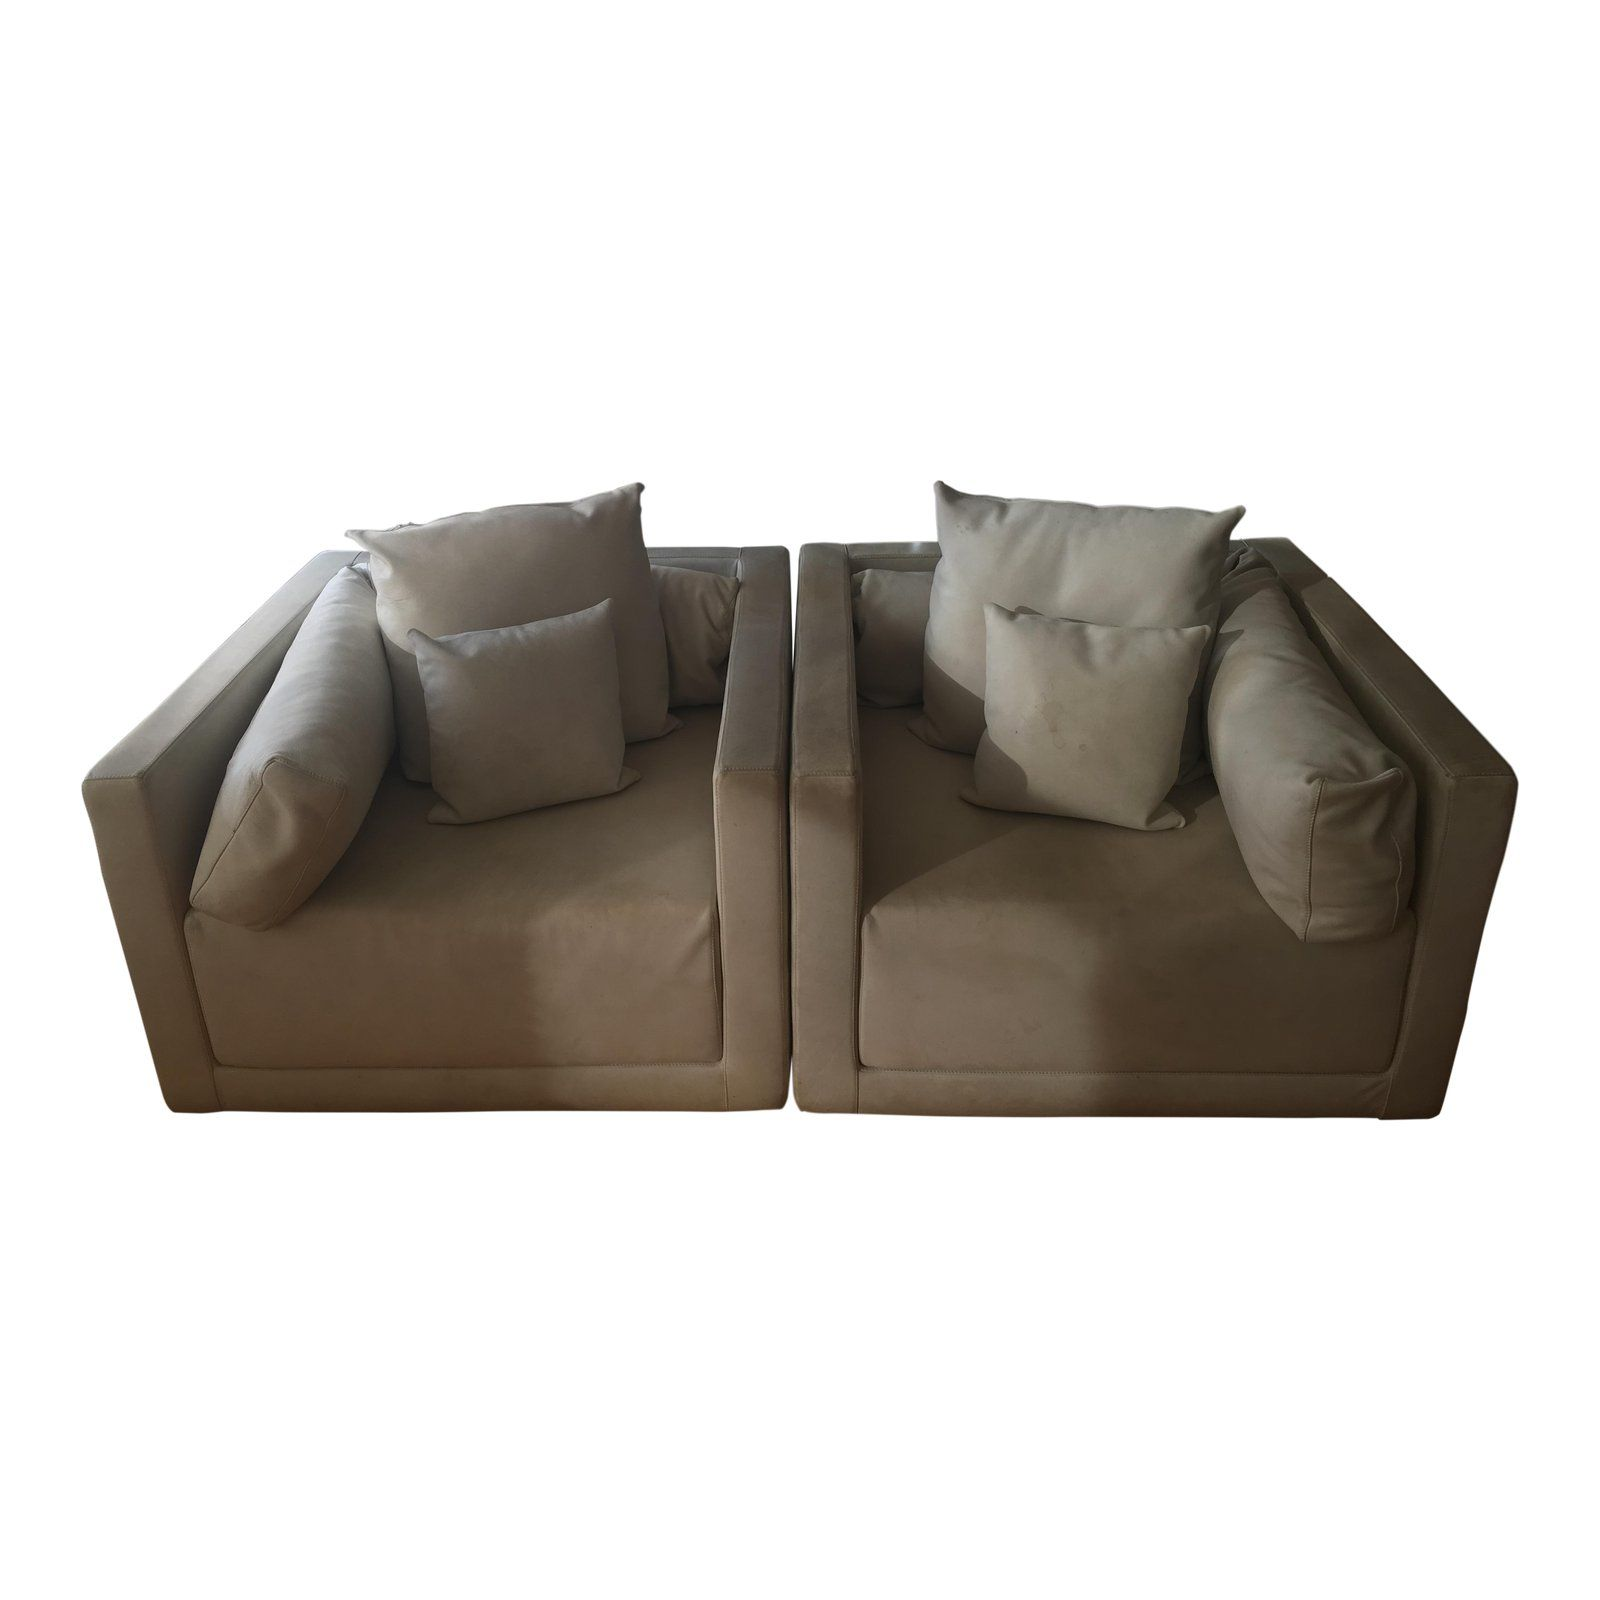 Armani Casa Sydney Chairs A Pair For Sale Chair And Ottoman Set Italian Armchairs Chair